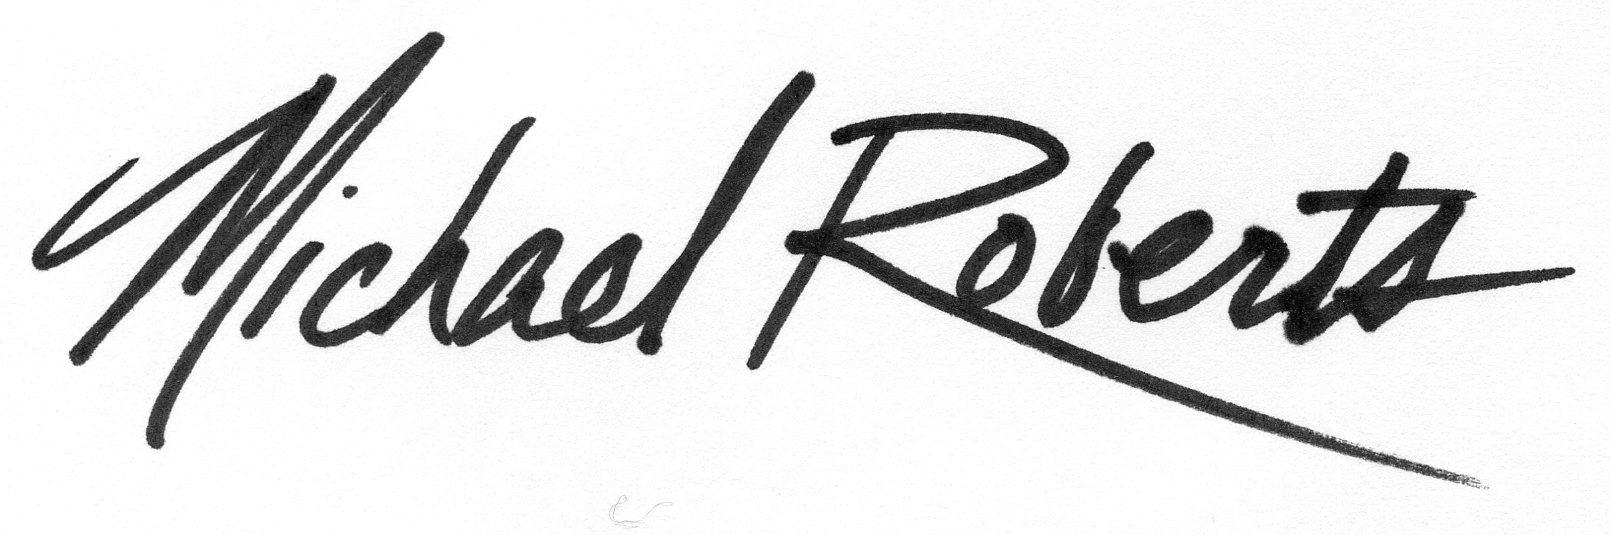 Michael Roberts's Signature